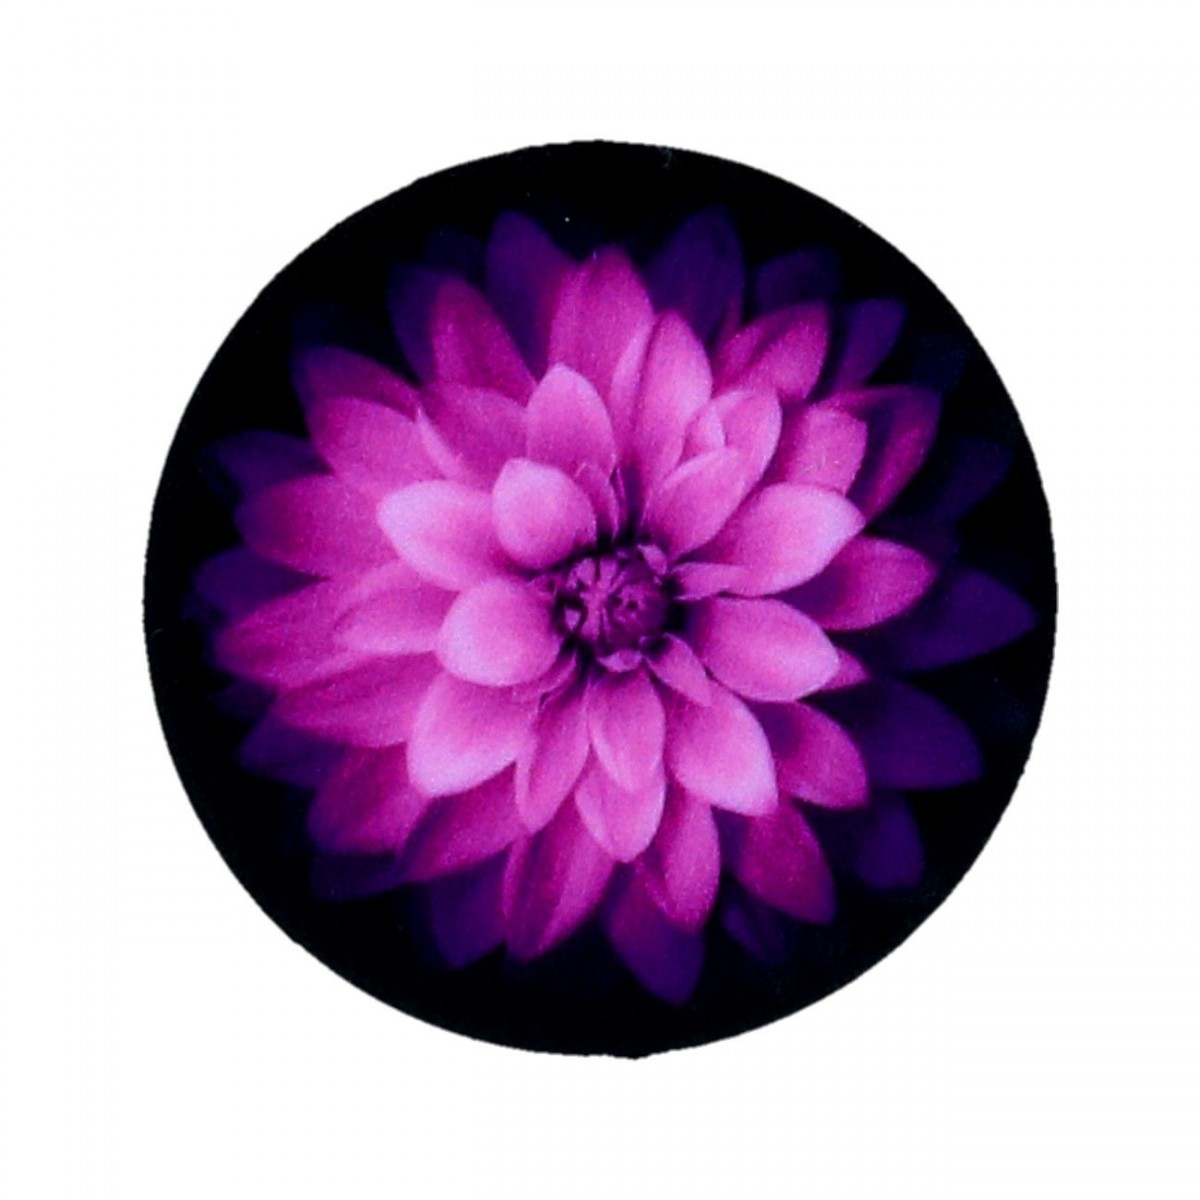 Držák na mobil TopQ PopSocket Purple Flower 36305